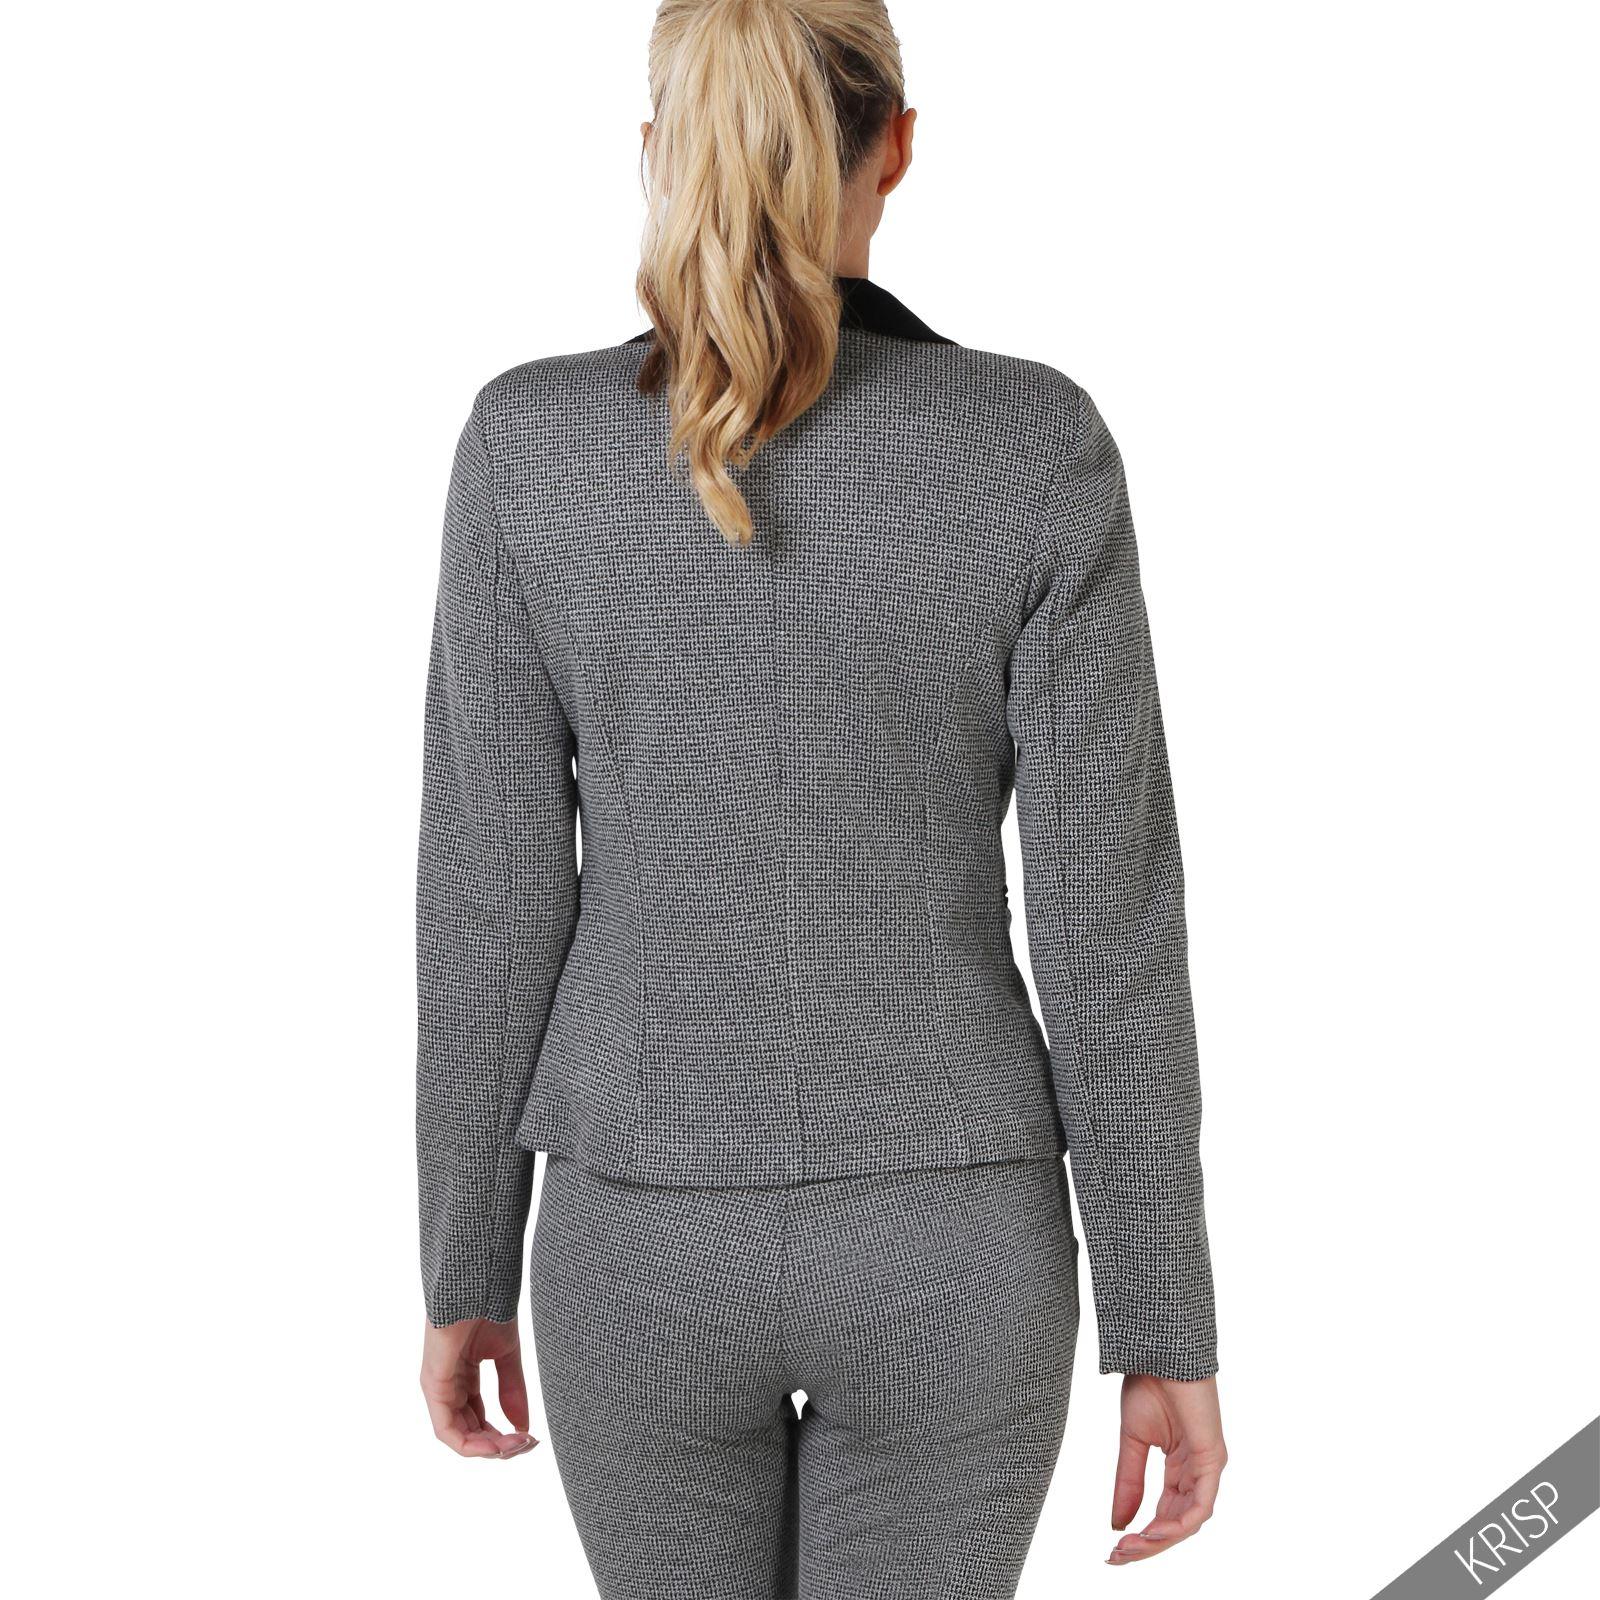 damen business hosenanzug eleganter blazer graue slim fit hose anzug set ebay. Black Bedroom Furniture Sets. Home Design Ideas